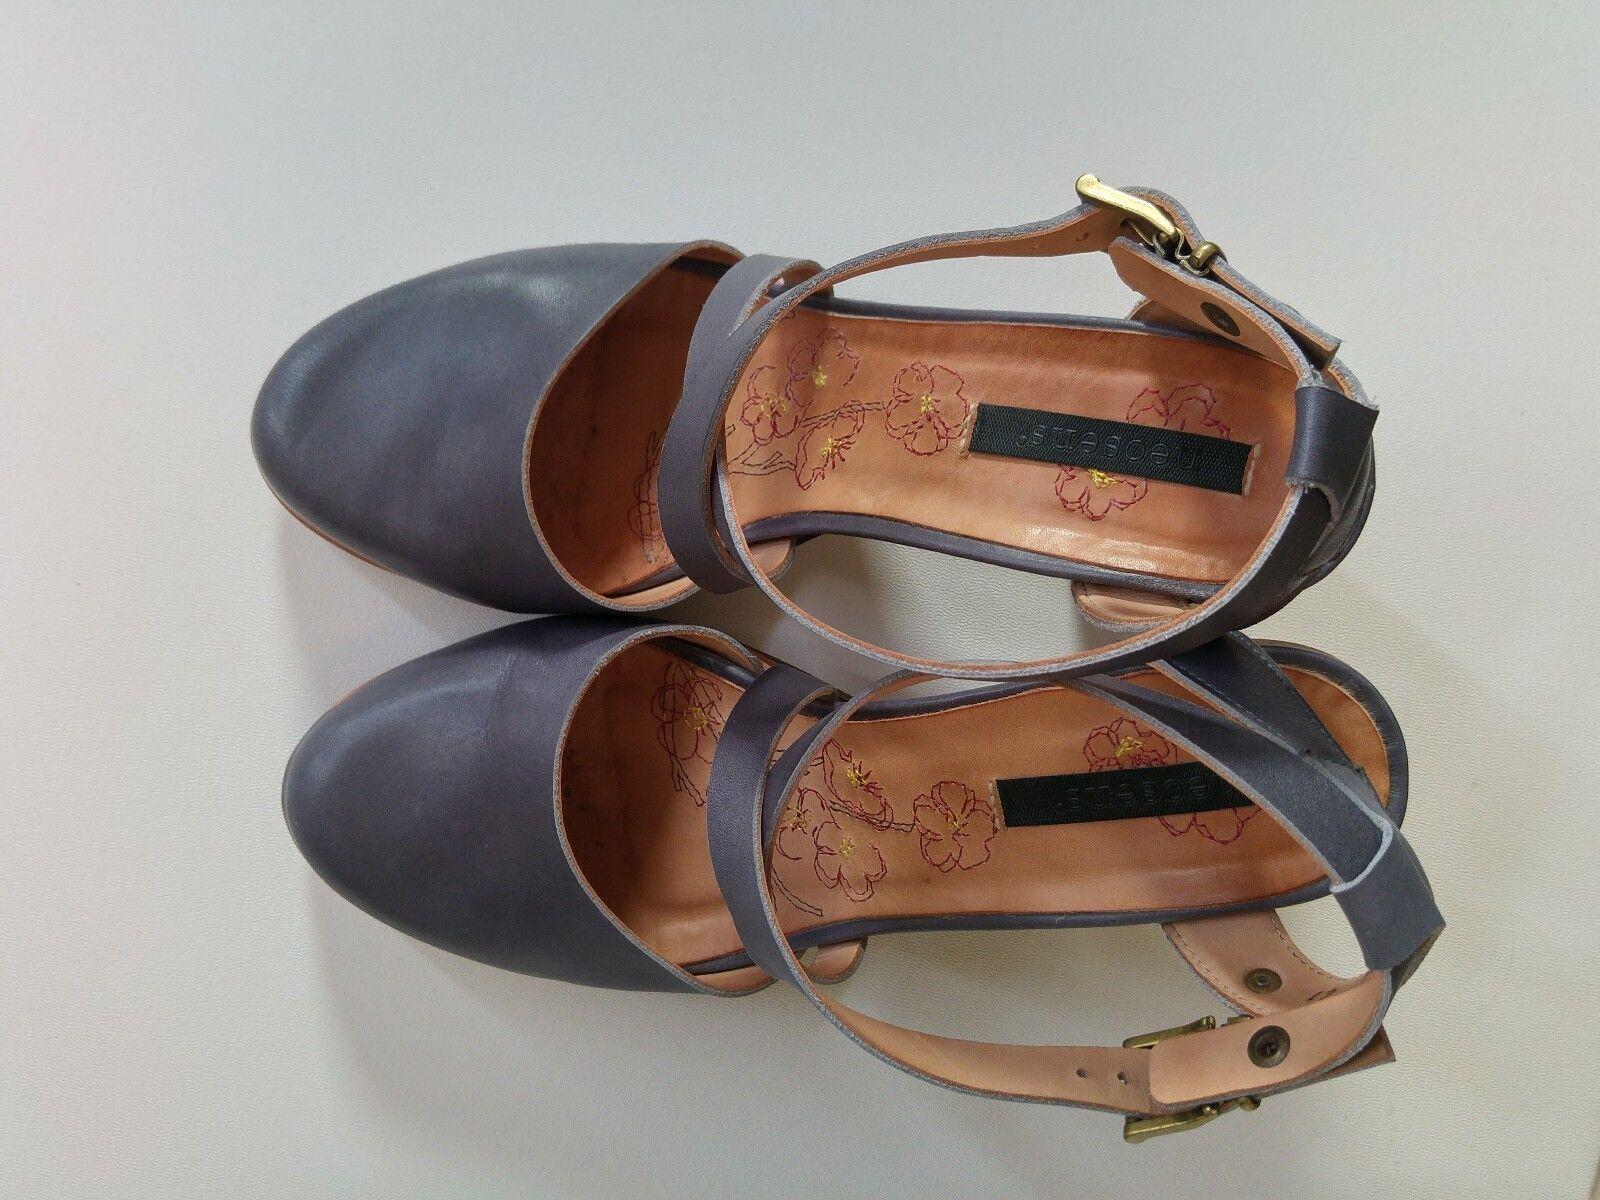 Neosens Gloria Damen Knöchelriemchen Sandale blau grau Gr. 41 (40) neuwertig